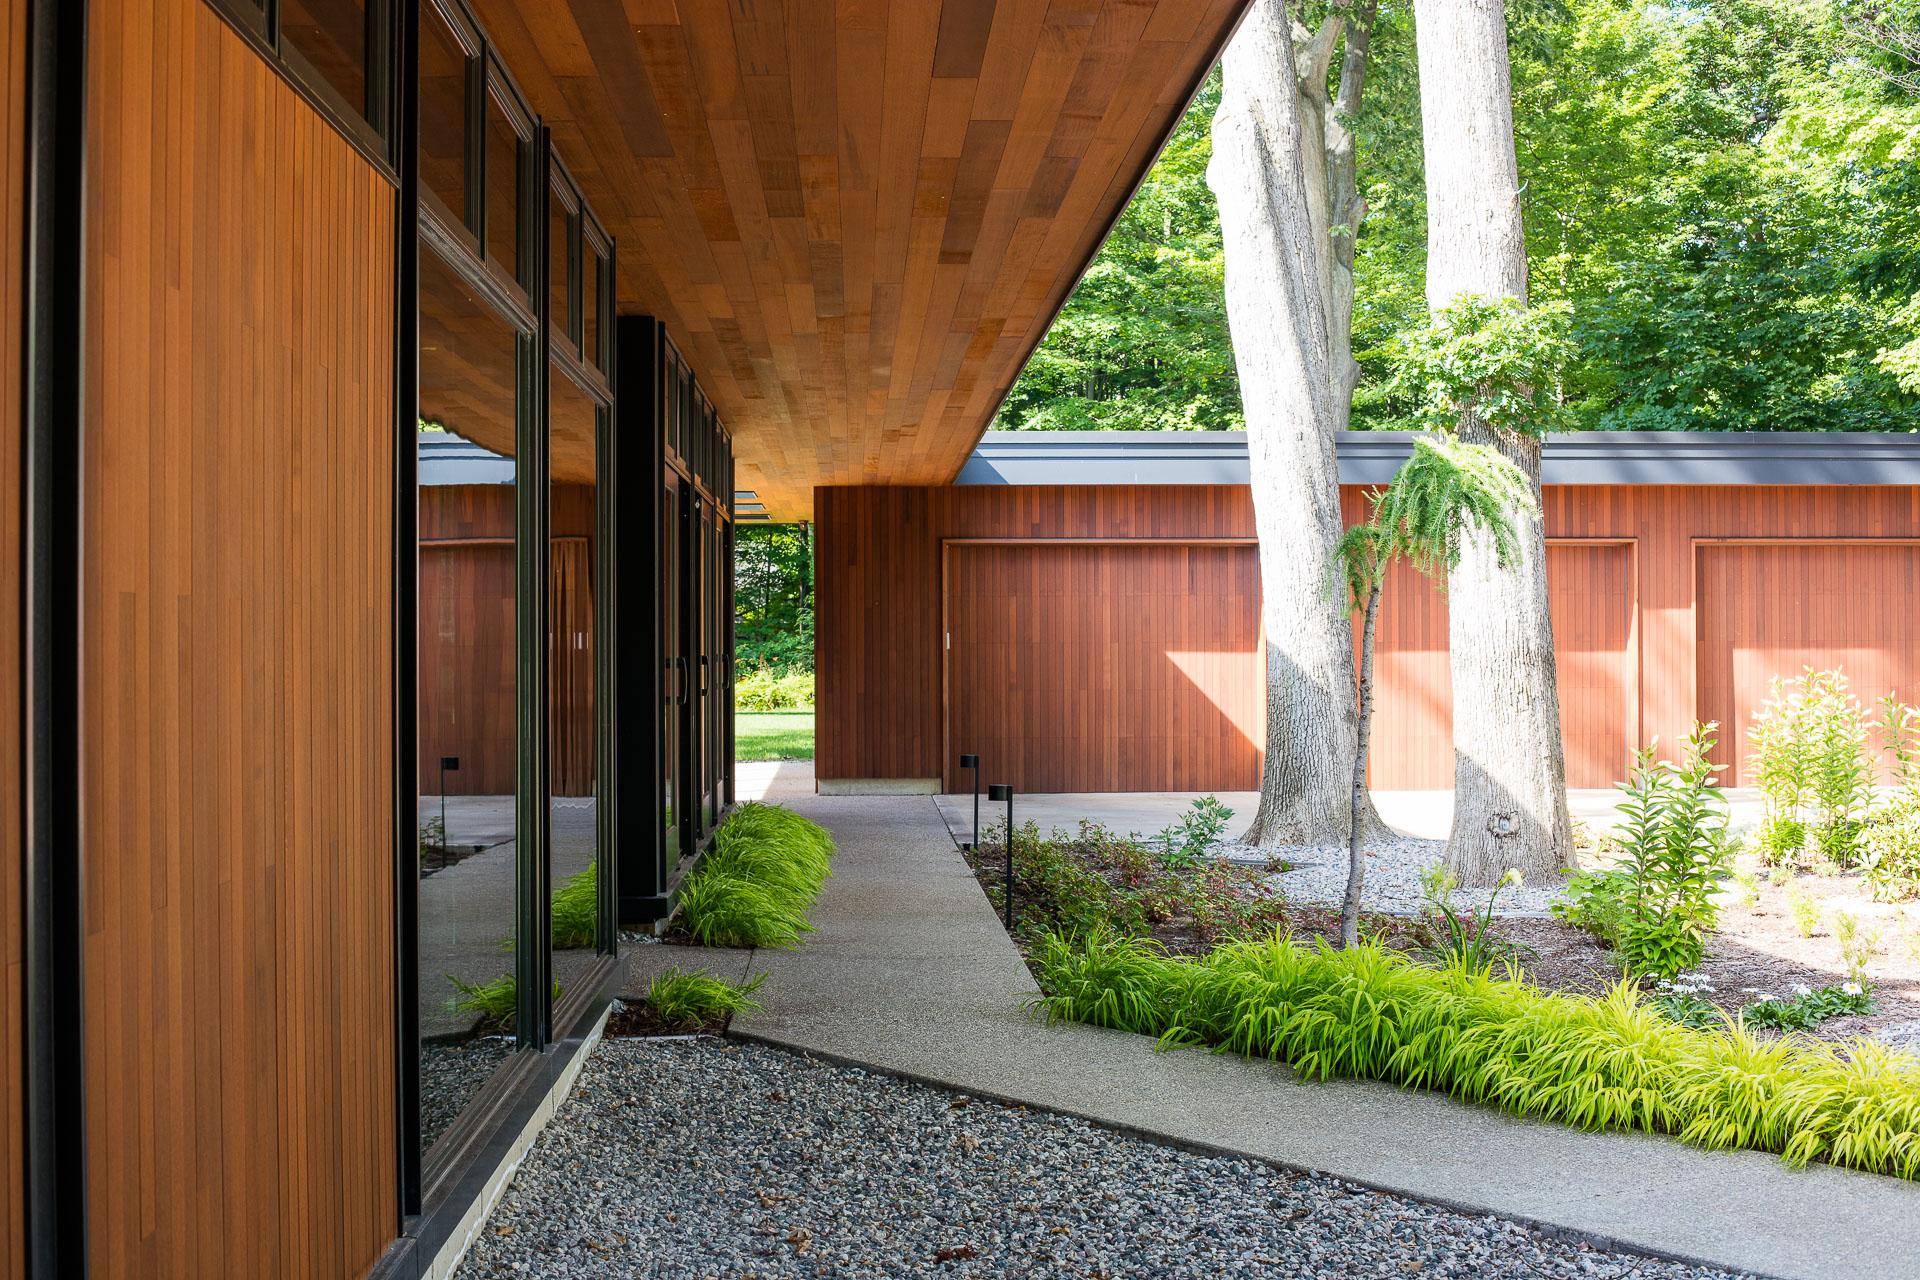 saugatuck mid century modern home plan design warm large roof overhang west michigan